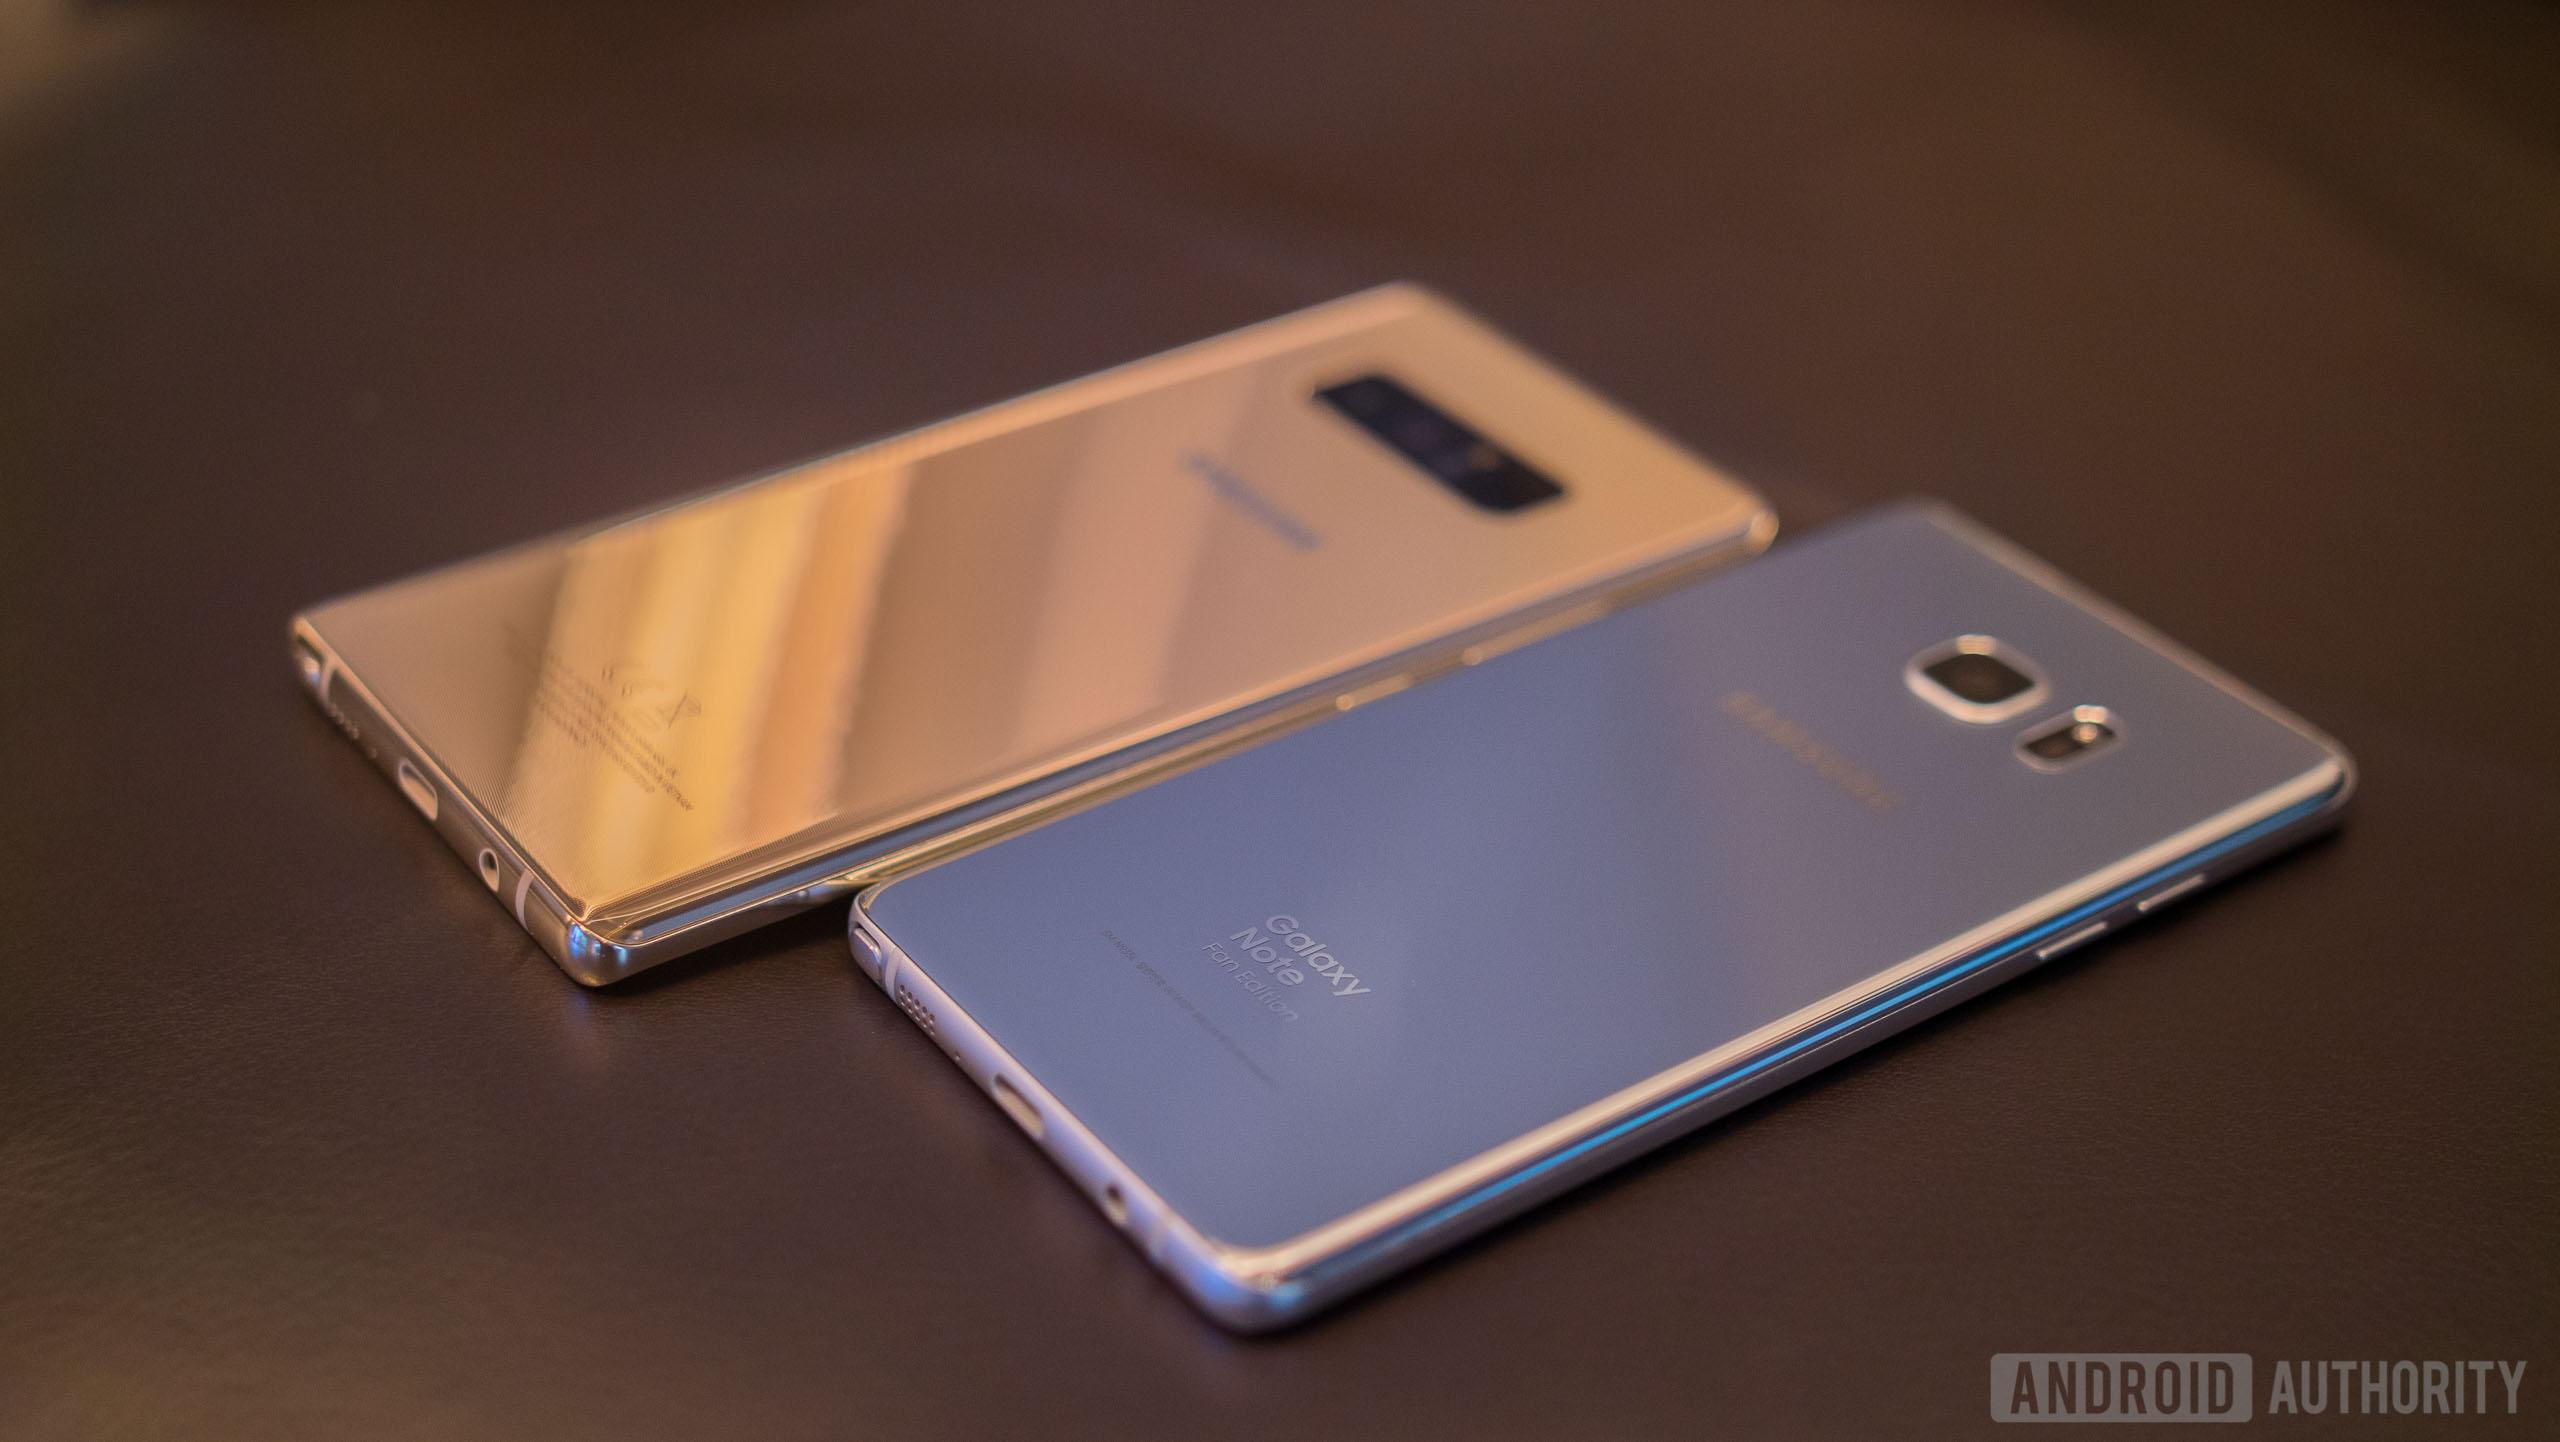 Samsung Galaxy Note 8 vs Samsung Galaxy Note Fan Edition